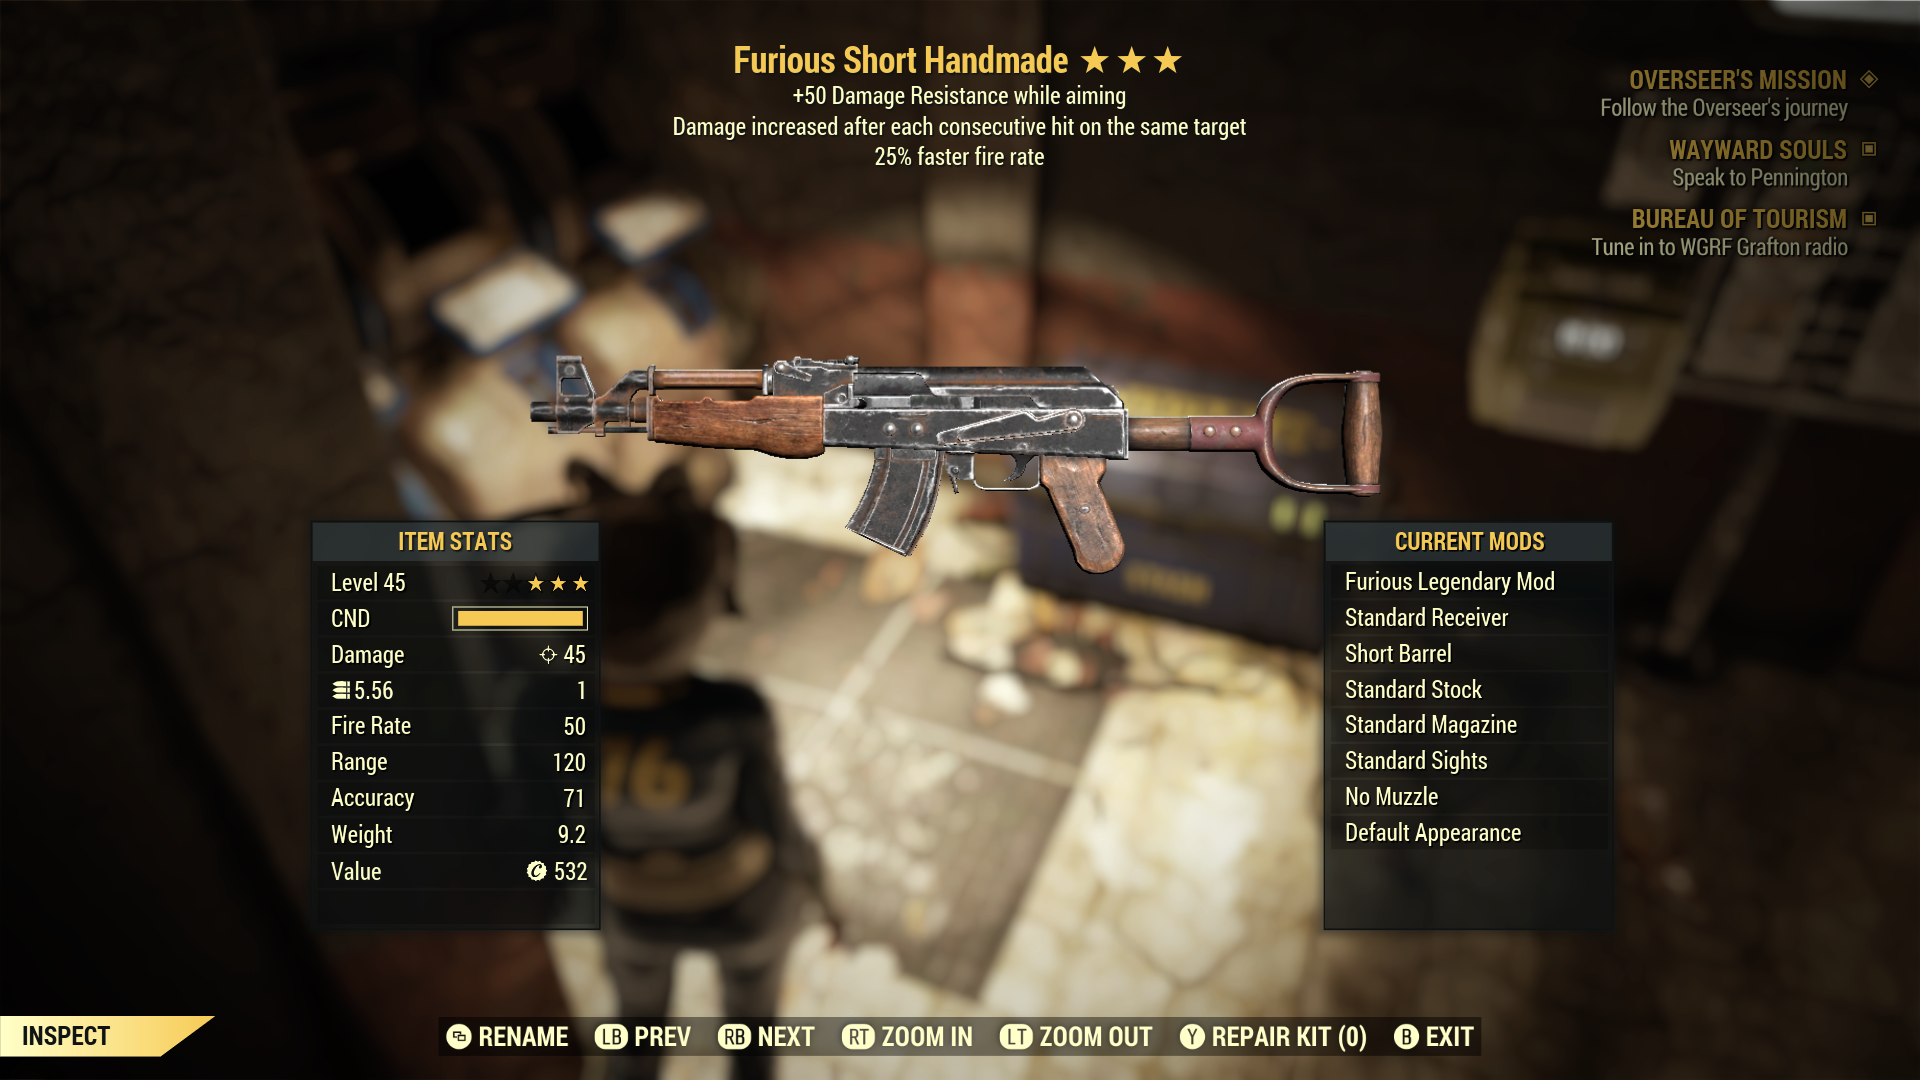 (New86)Furious Short Handmade - Level 45